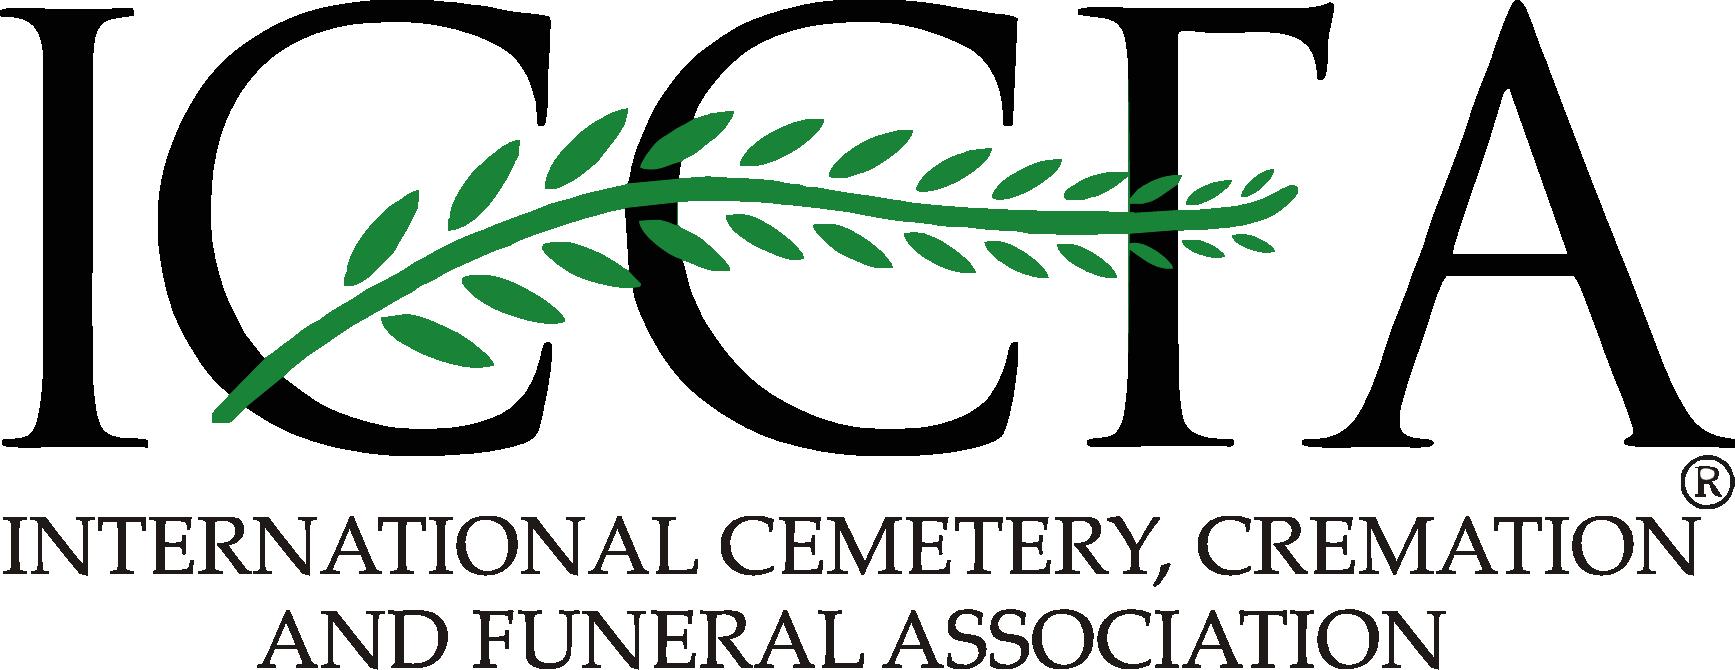 Devargas home crematory inc. Graveyard clipart funeral